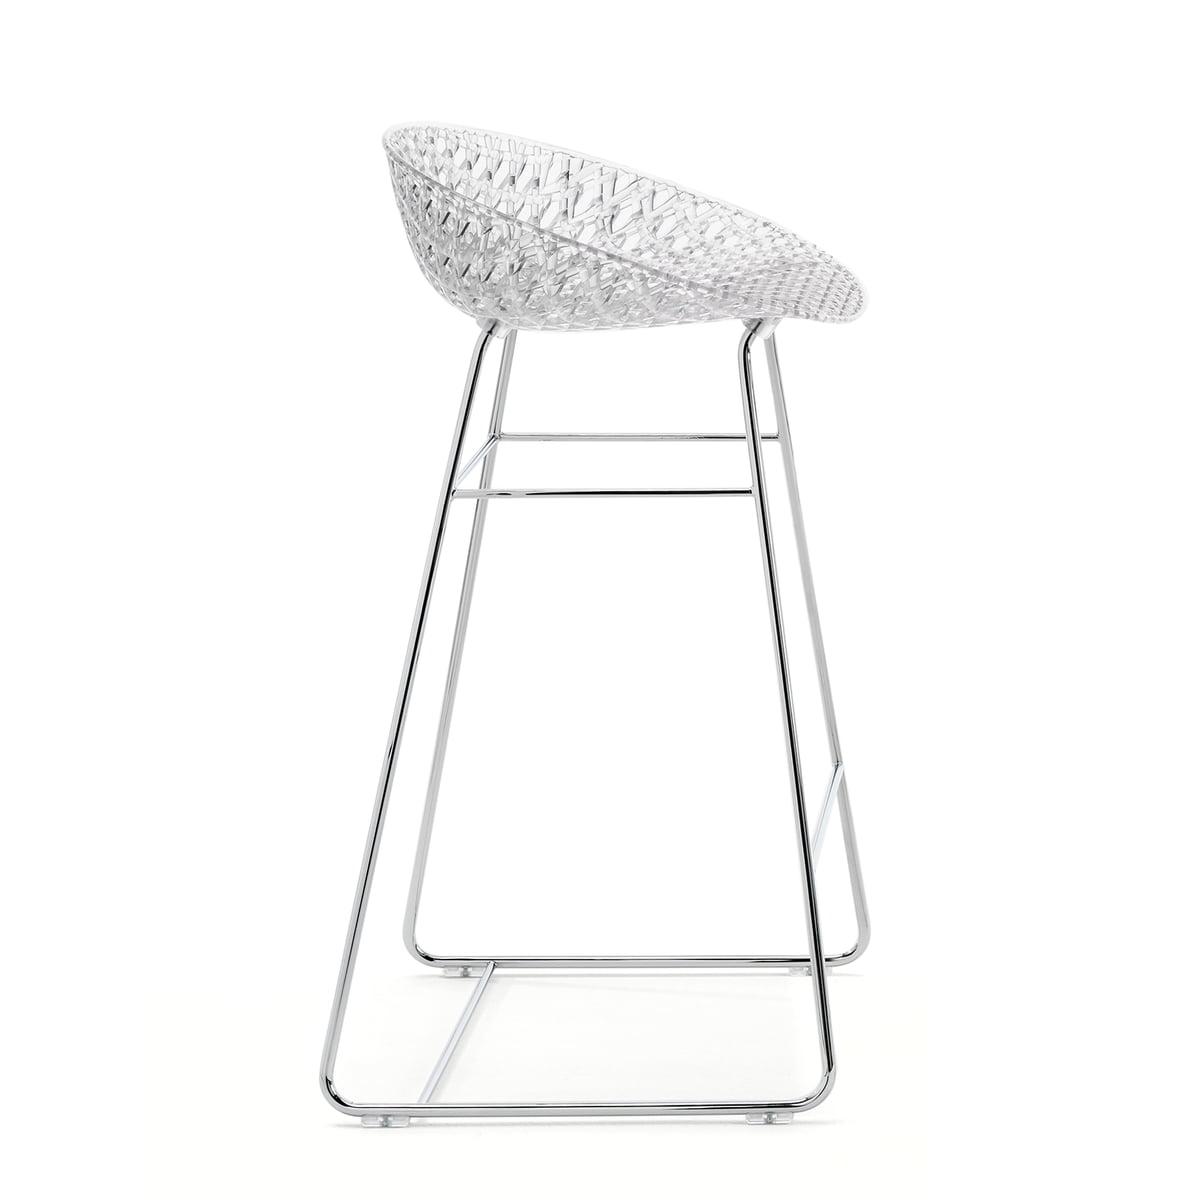 Remarkable Kartell Smatrik Bar Stool Chrome Plated Crystal Uwap Interior Chair Design Uwaporg